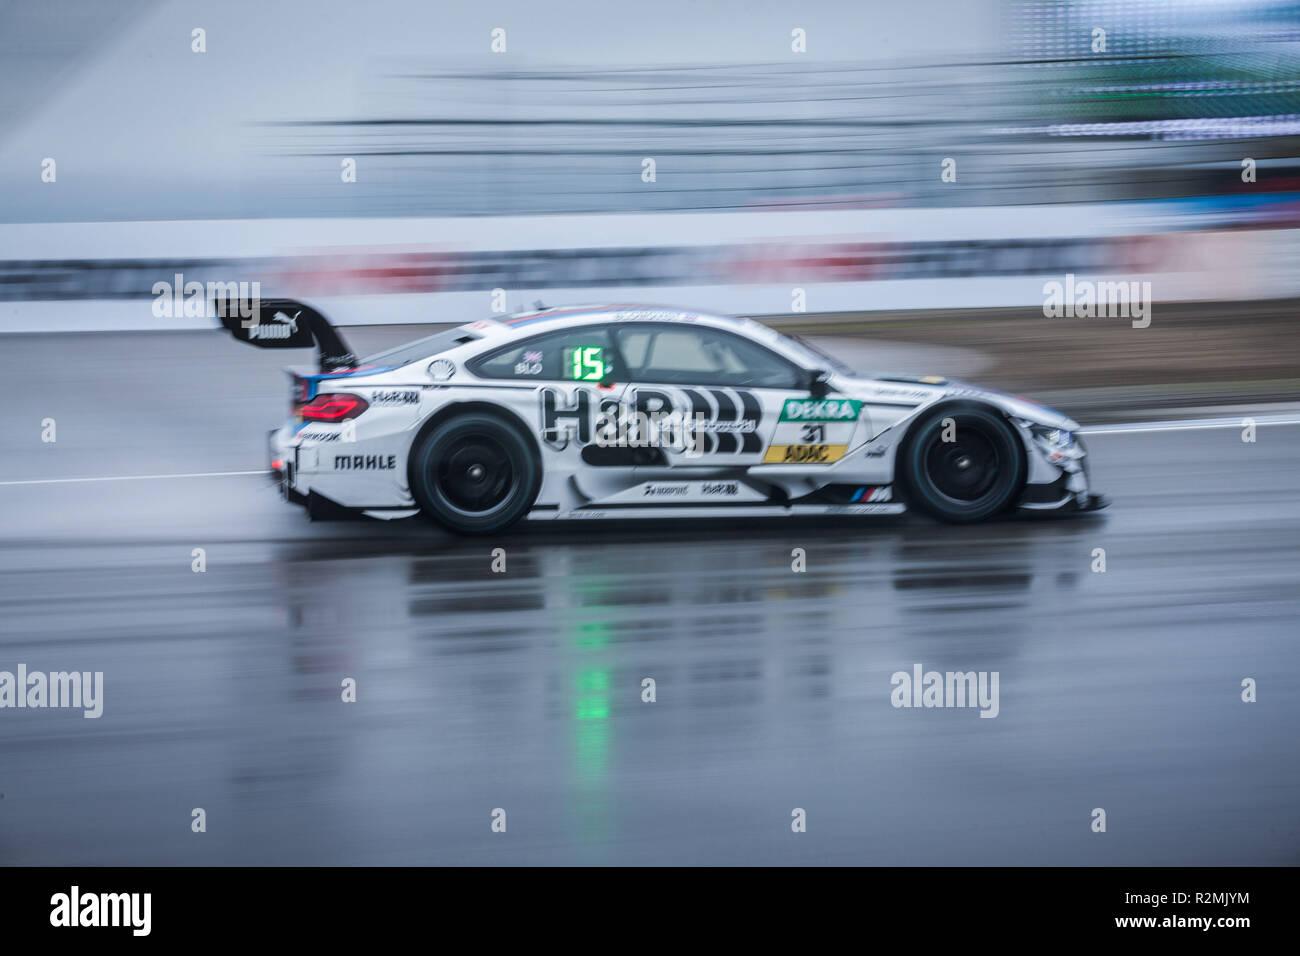 DTM racing car on wet race track, BMW M4 DTM - Stock Image